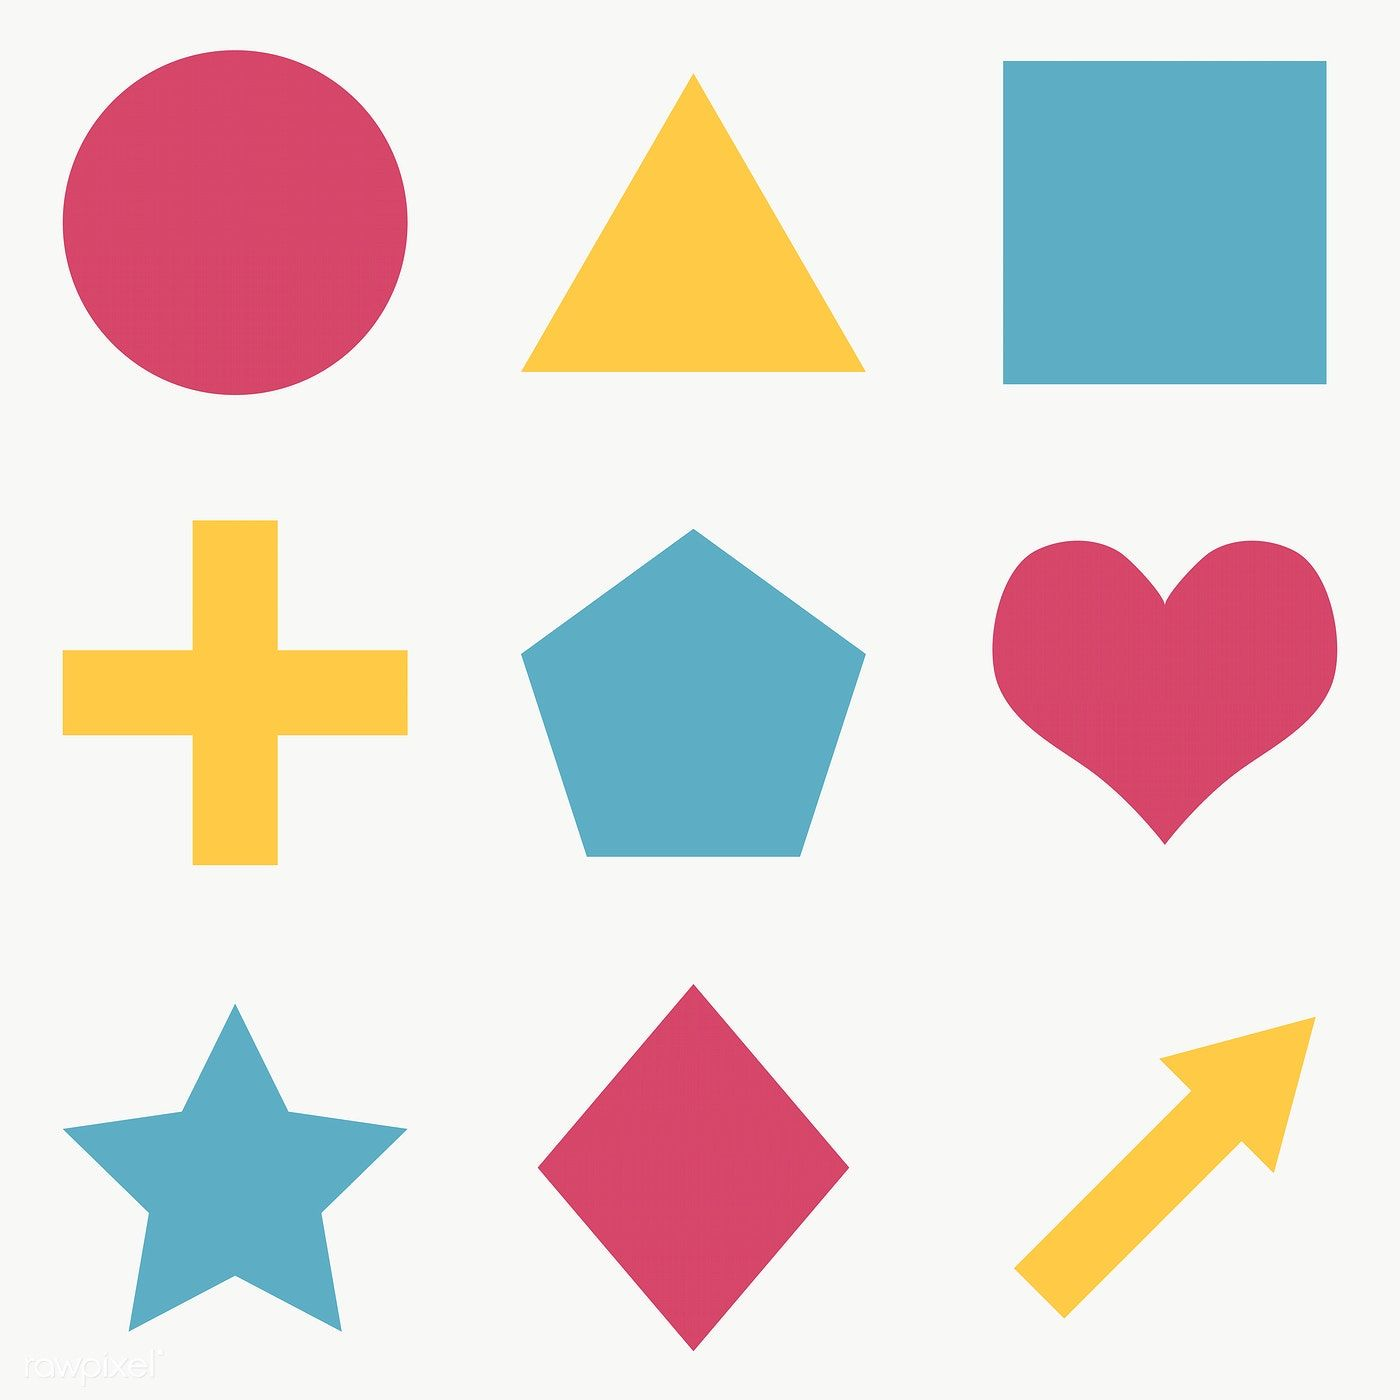 Colorful Flat Geometric Shapes Set Transparent Png Free Image By Rawpixel Com Ningzk V Geometric Shapes Geometric Shapes